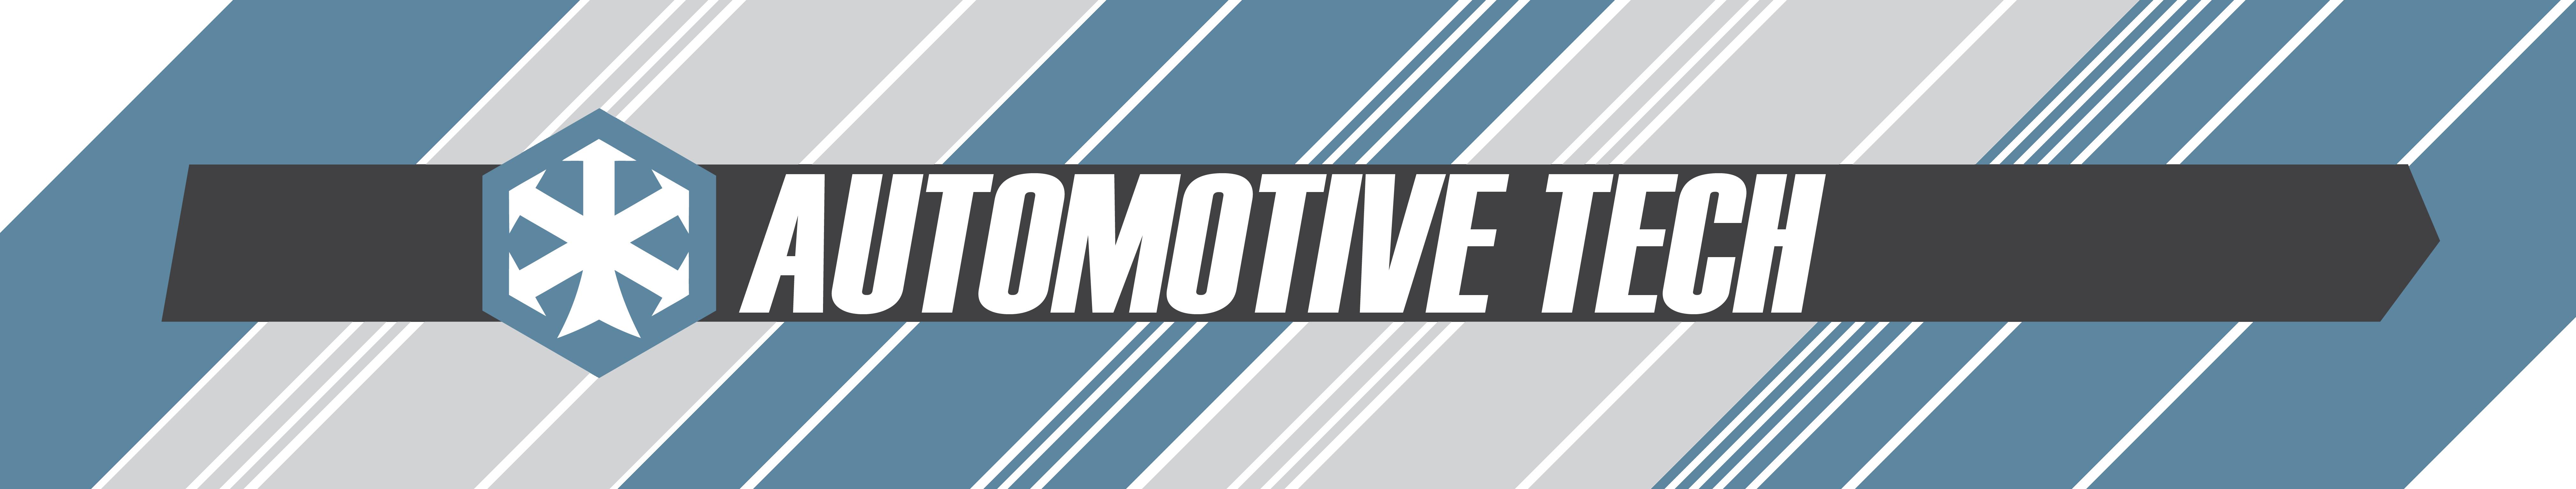 Automotive Eastern Oklahoma County Technology Center